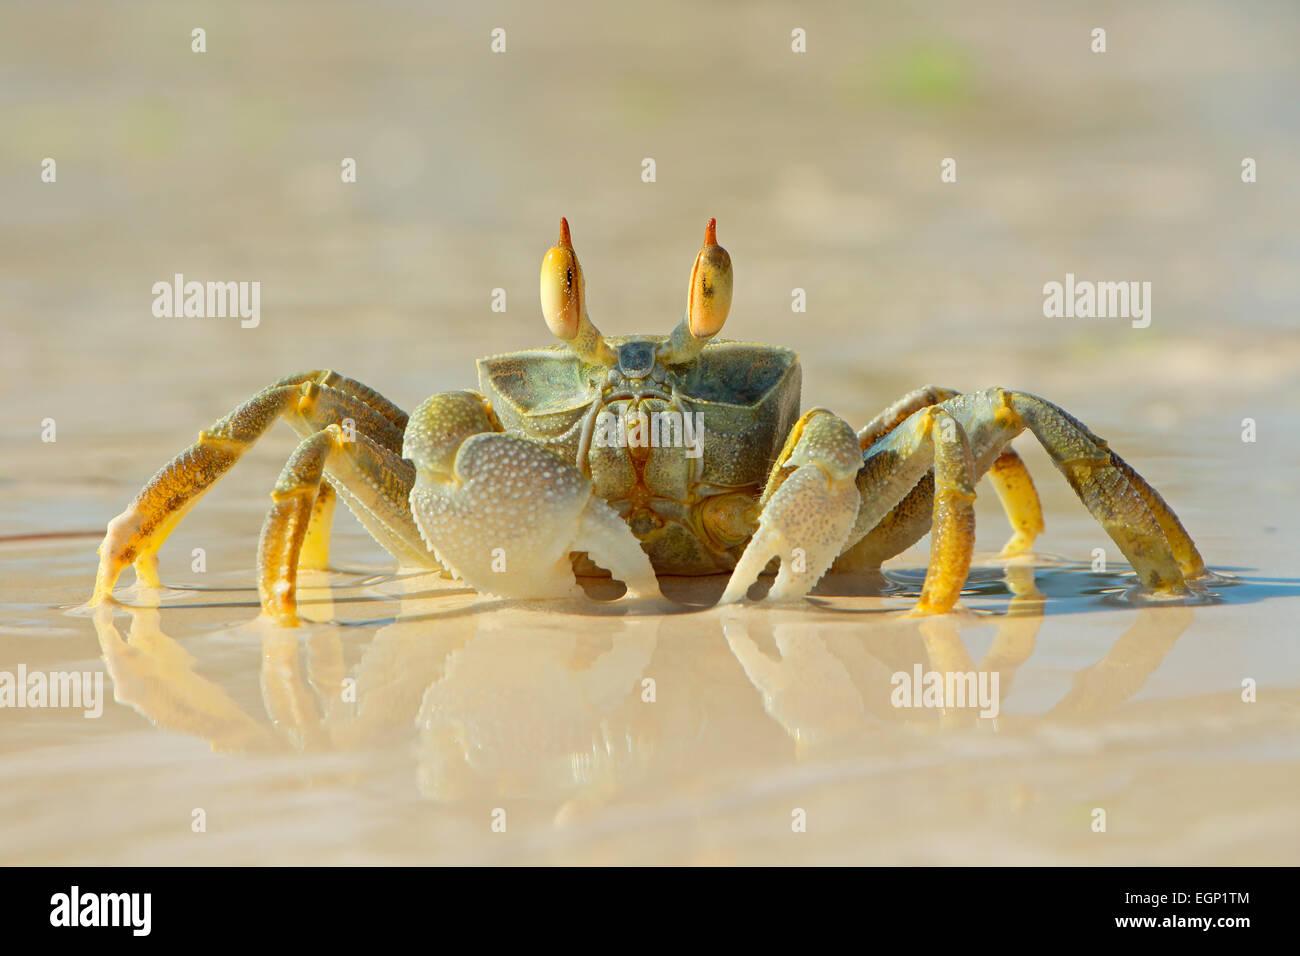 Alerta cangrejo fantasma en la playa, en la isla de Zanzíbar, Tanzania Foto de stock